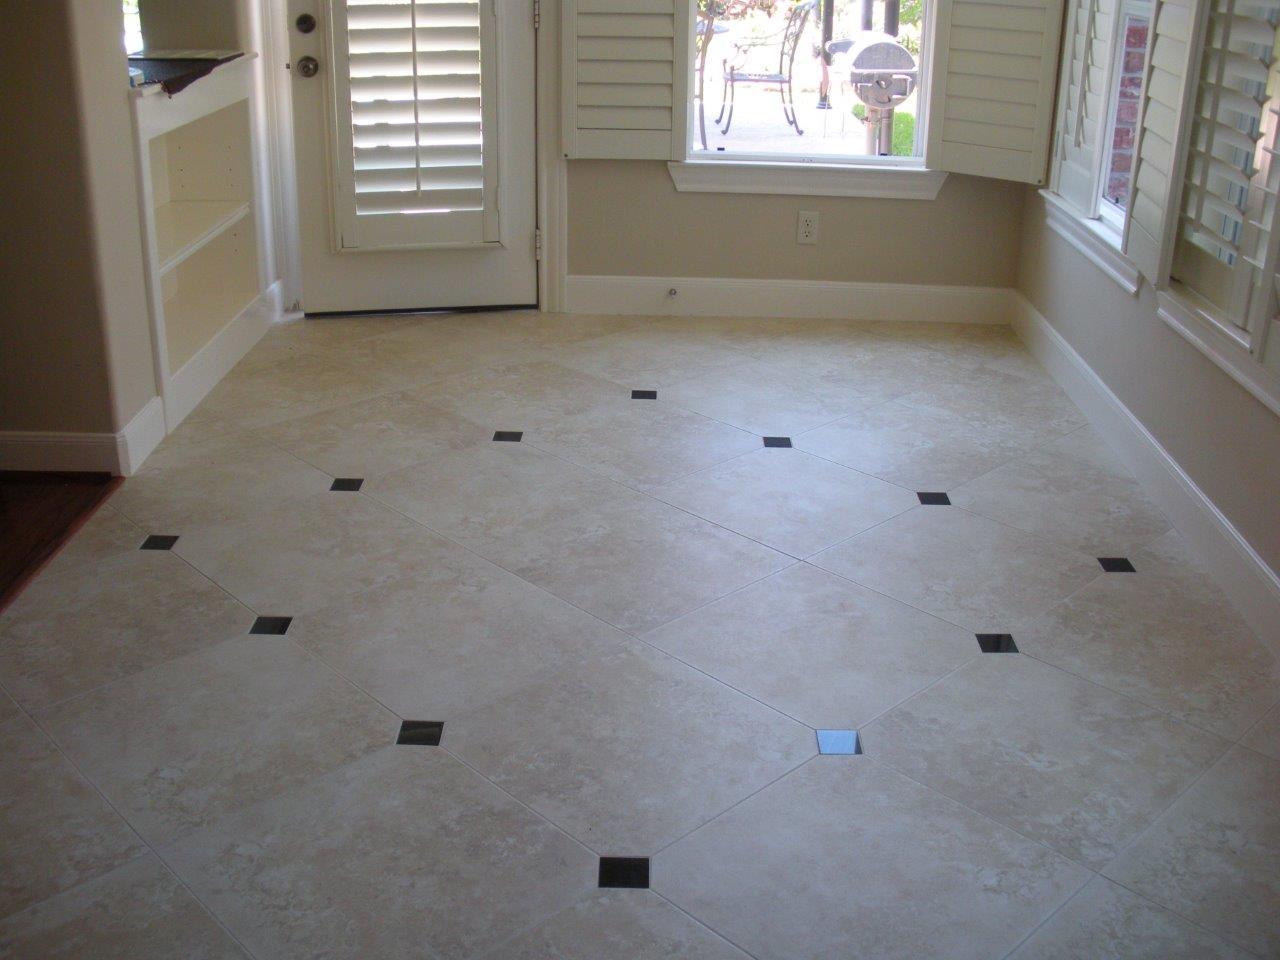 Dise o de pisos cocinas y ba os reposteros encimeras for Piso de concreto cera cocina